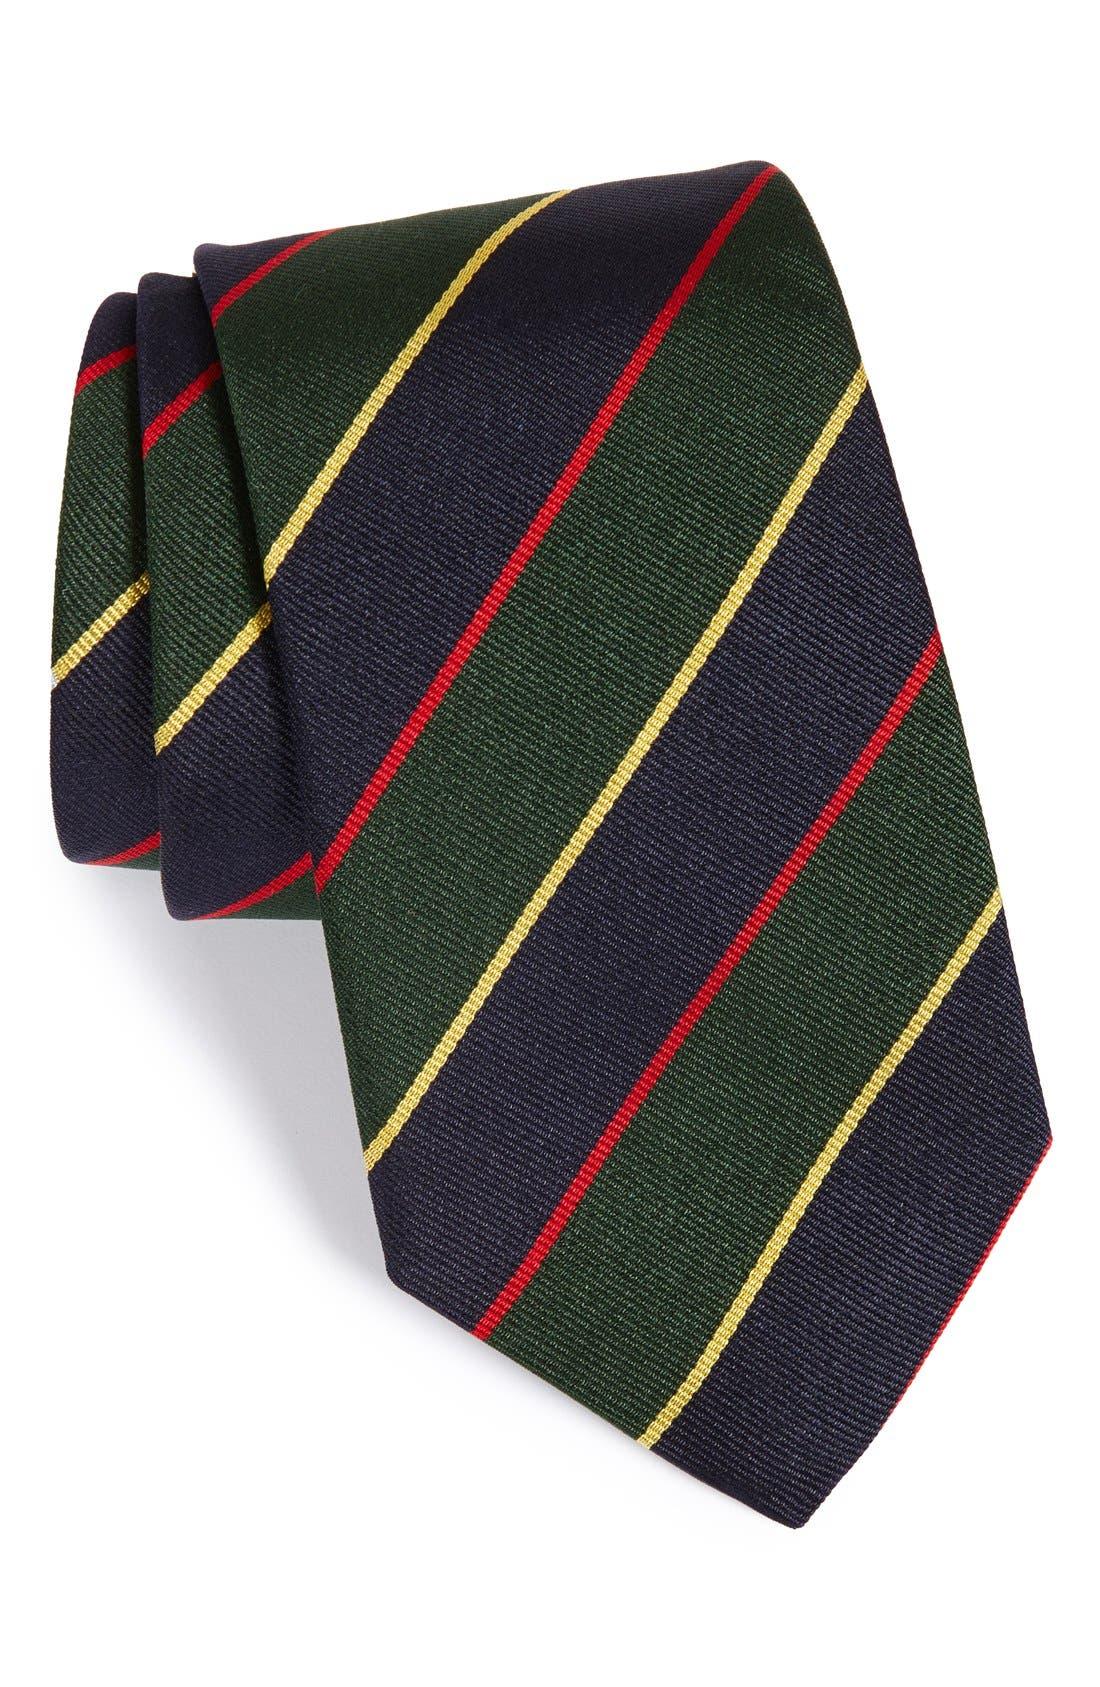 StripeSilk Tie,                         Main,                         color, Navy